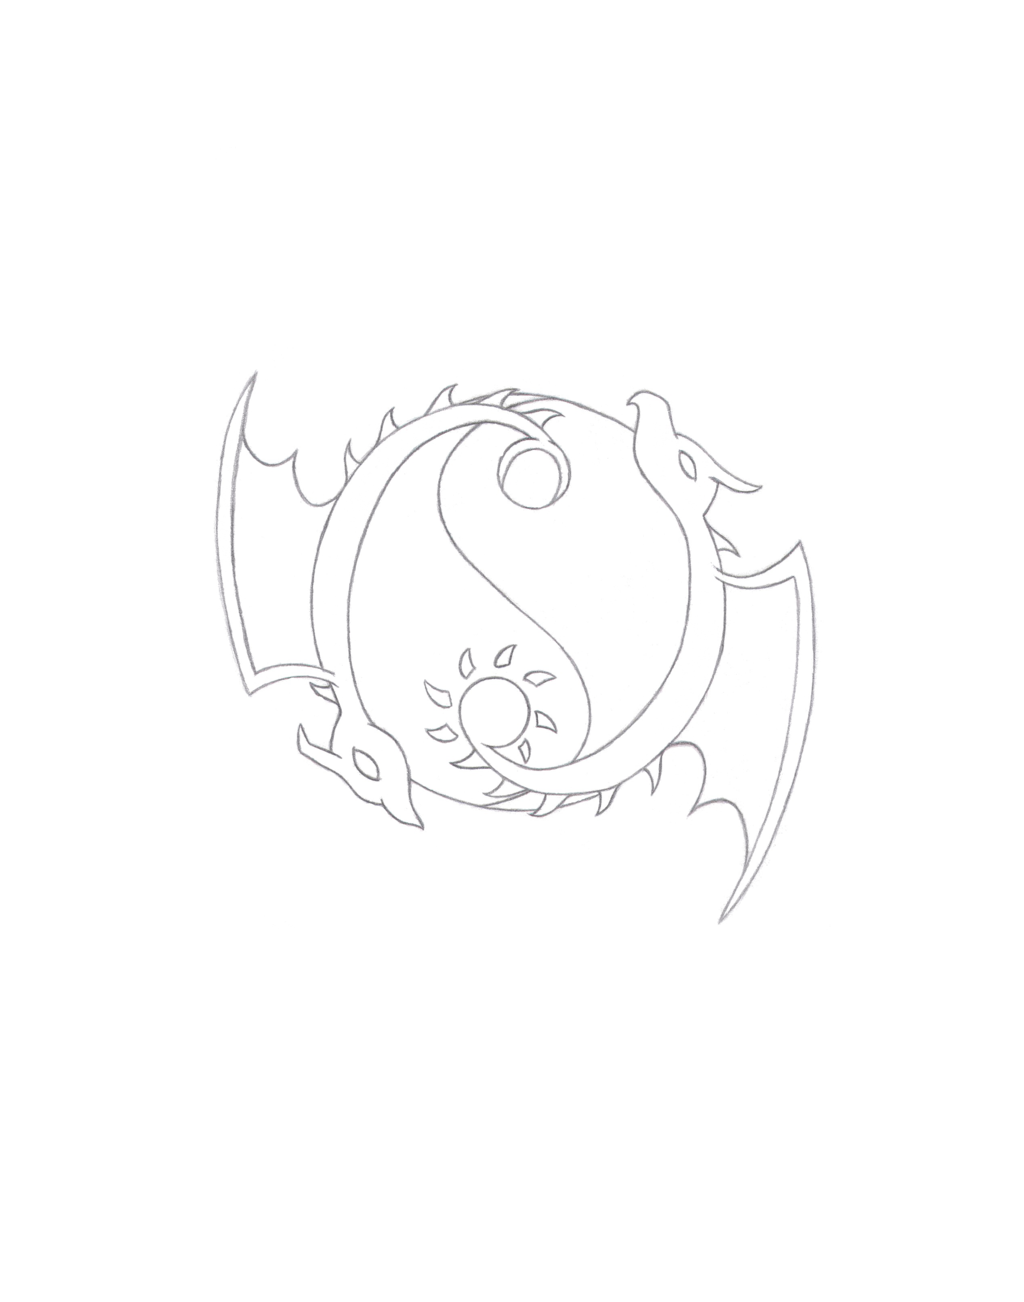 yin yang drawing designs at getdrawings  free download